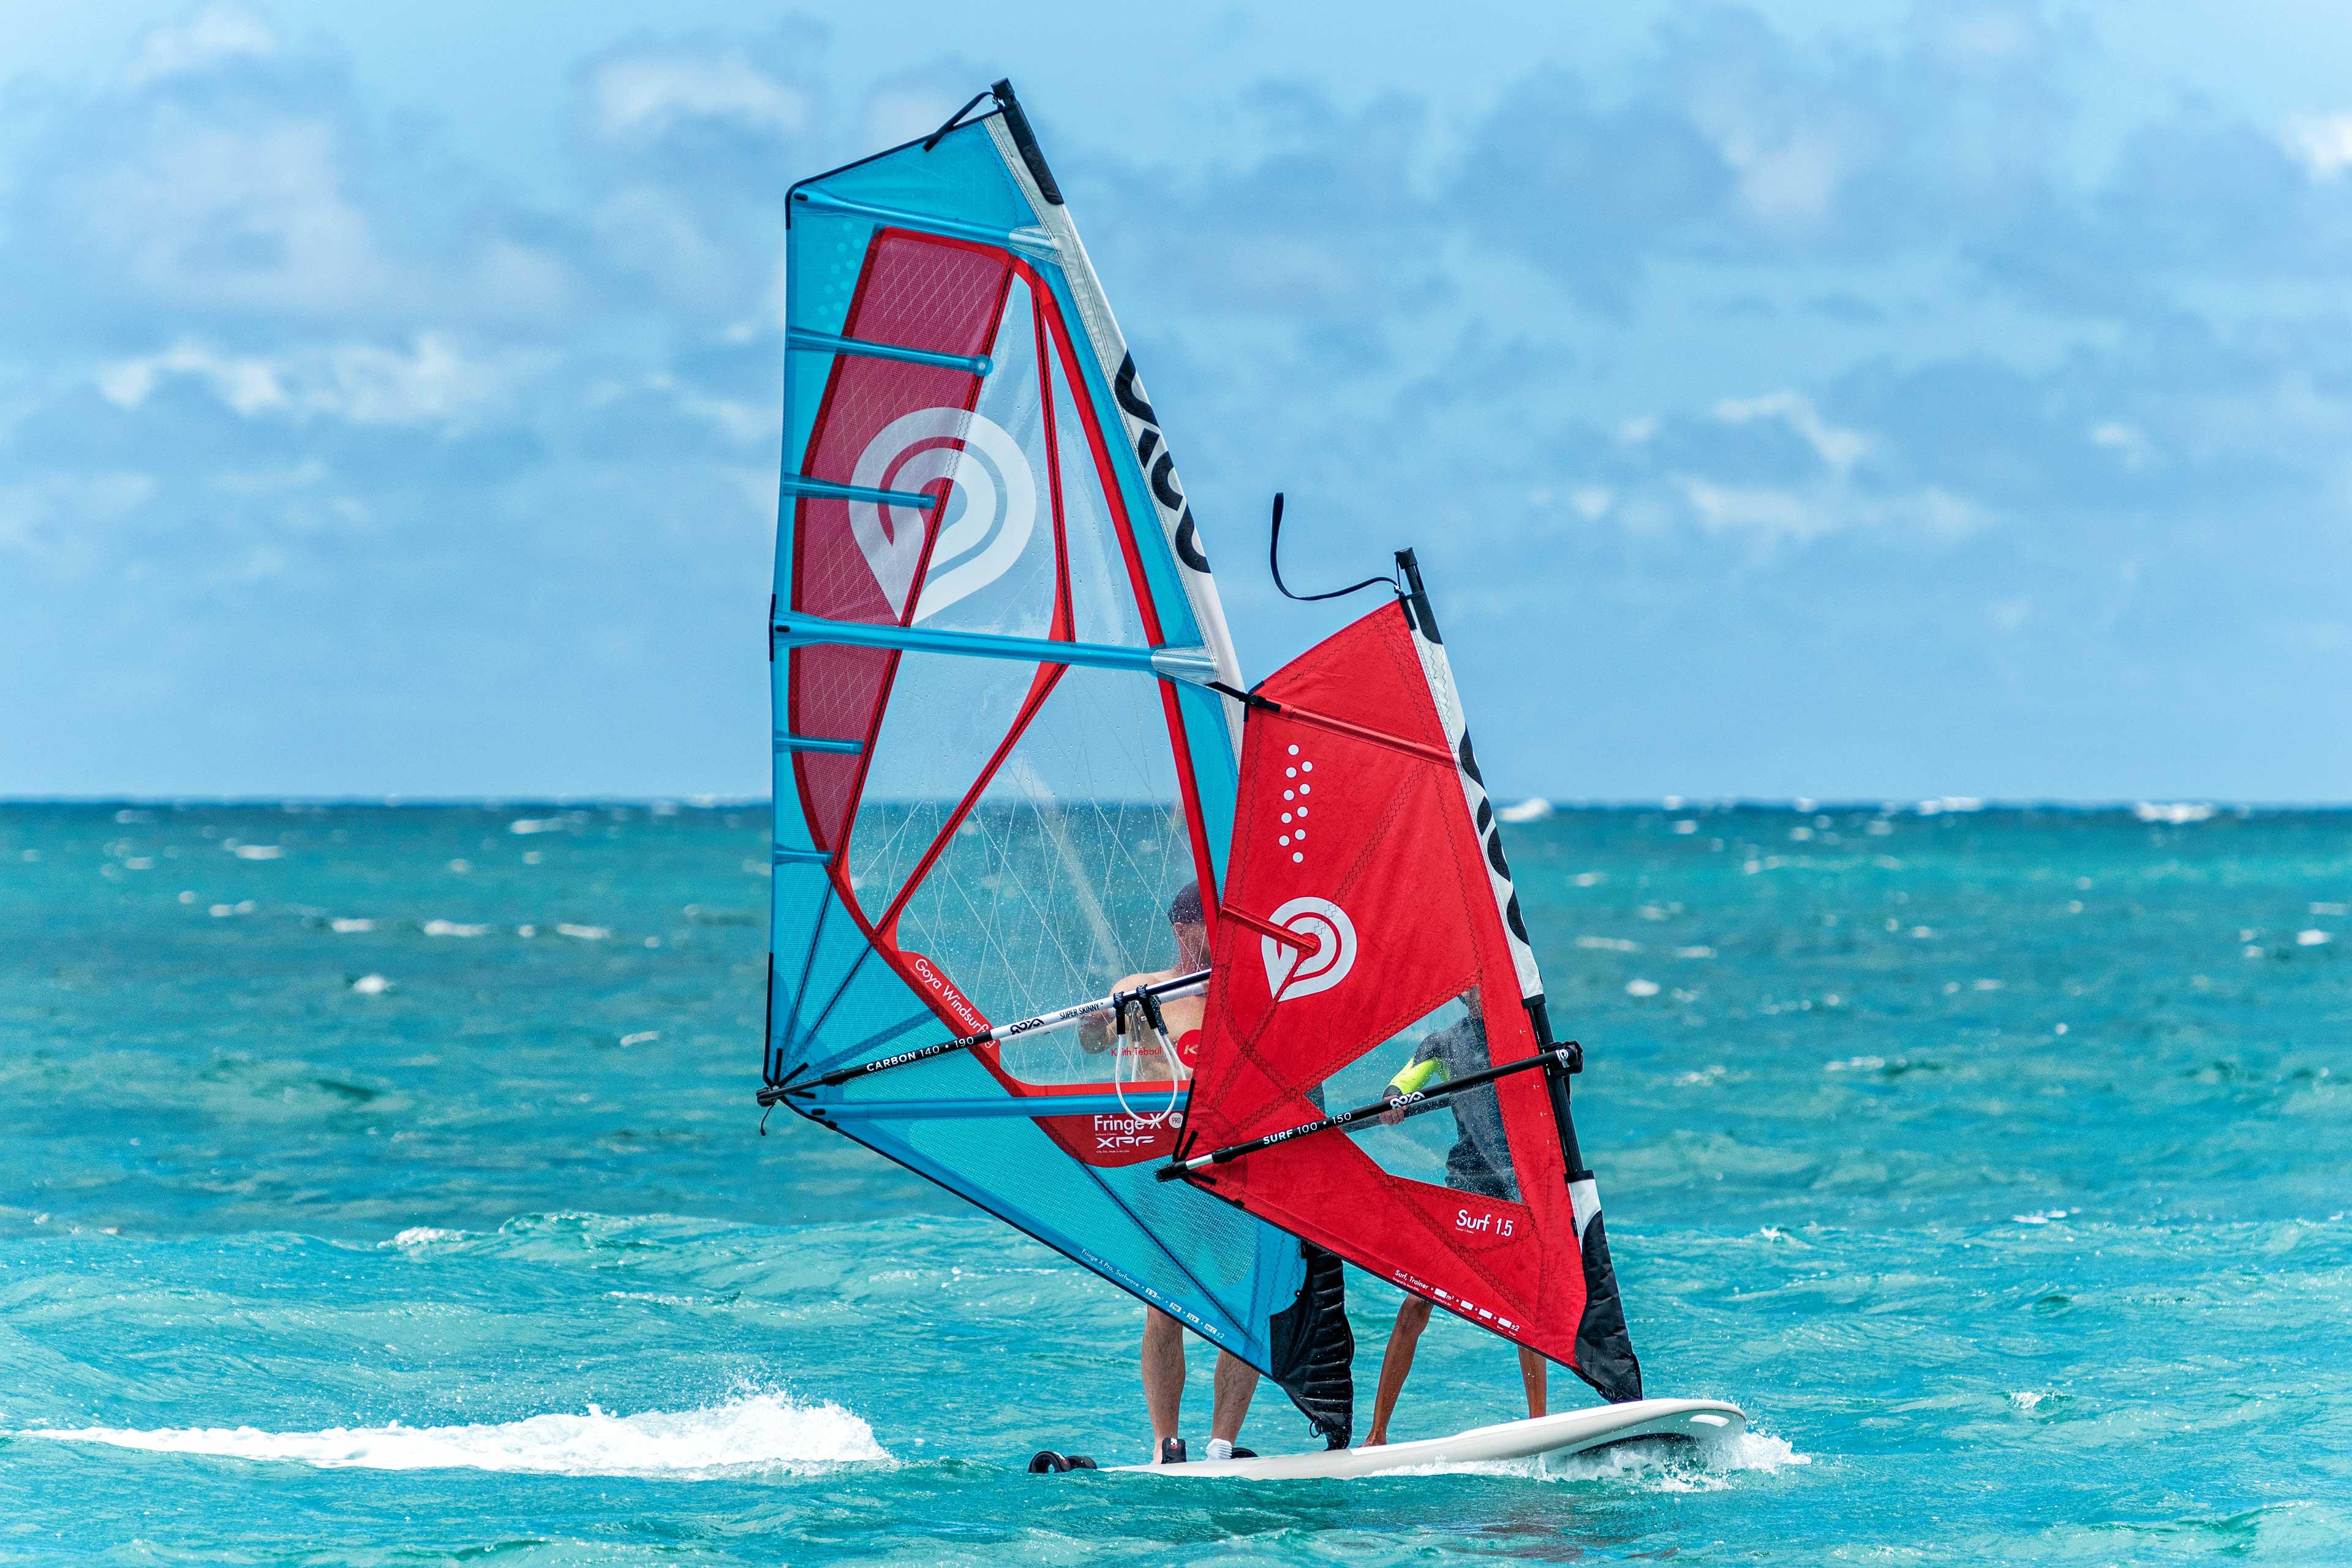 Goya Windsurfing - Boards - Surf